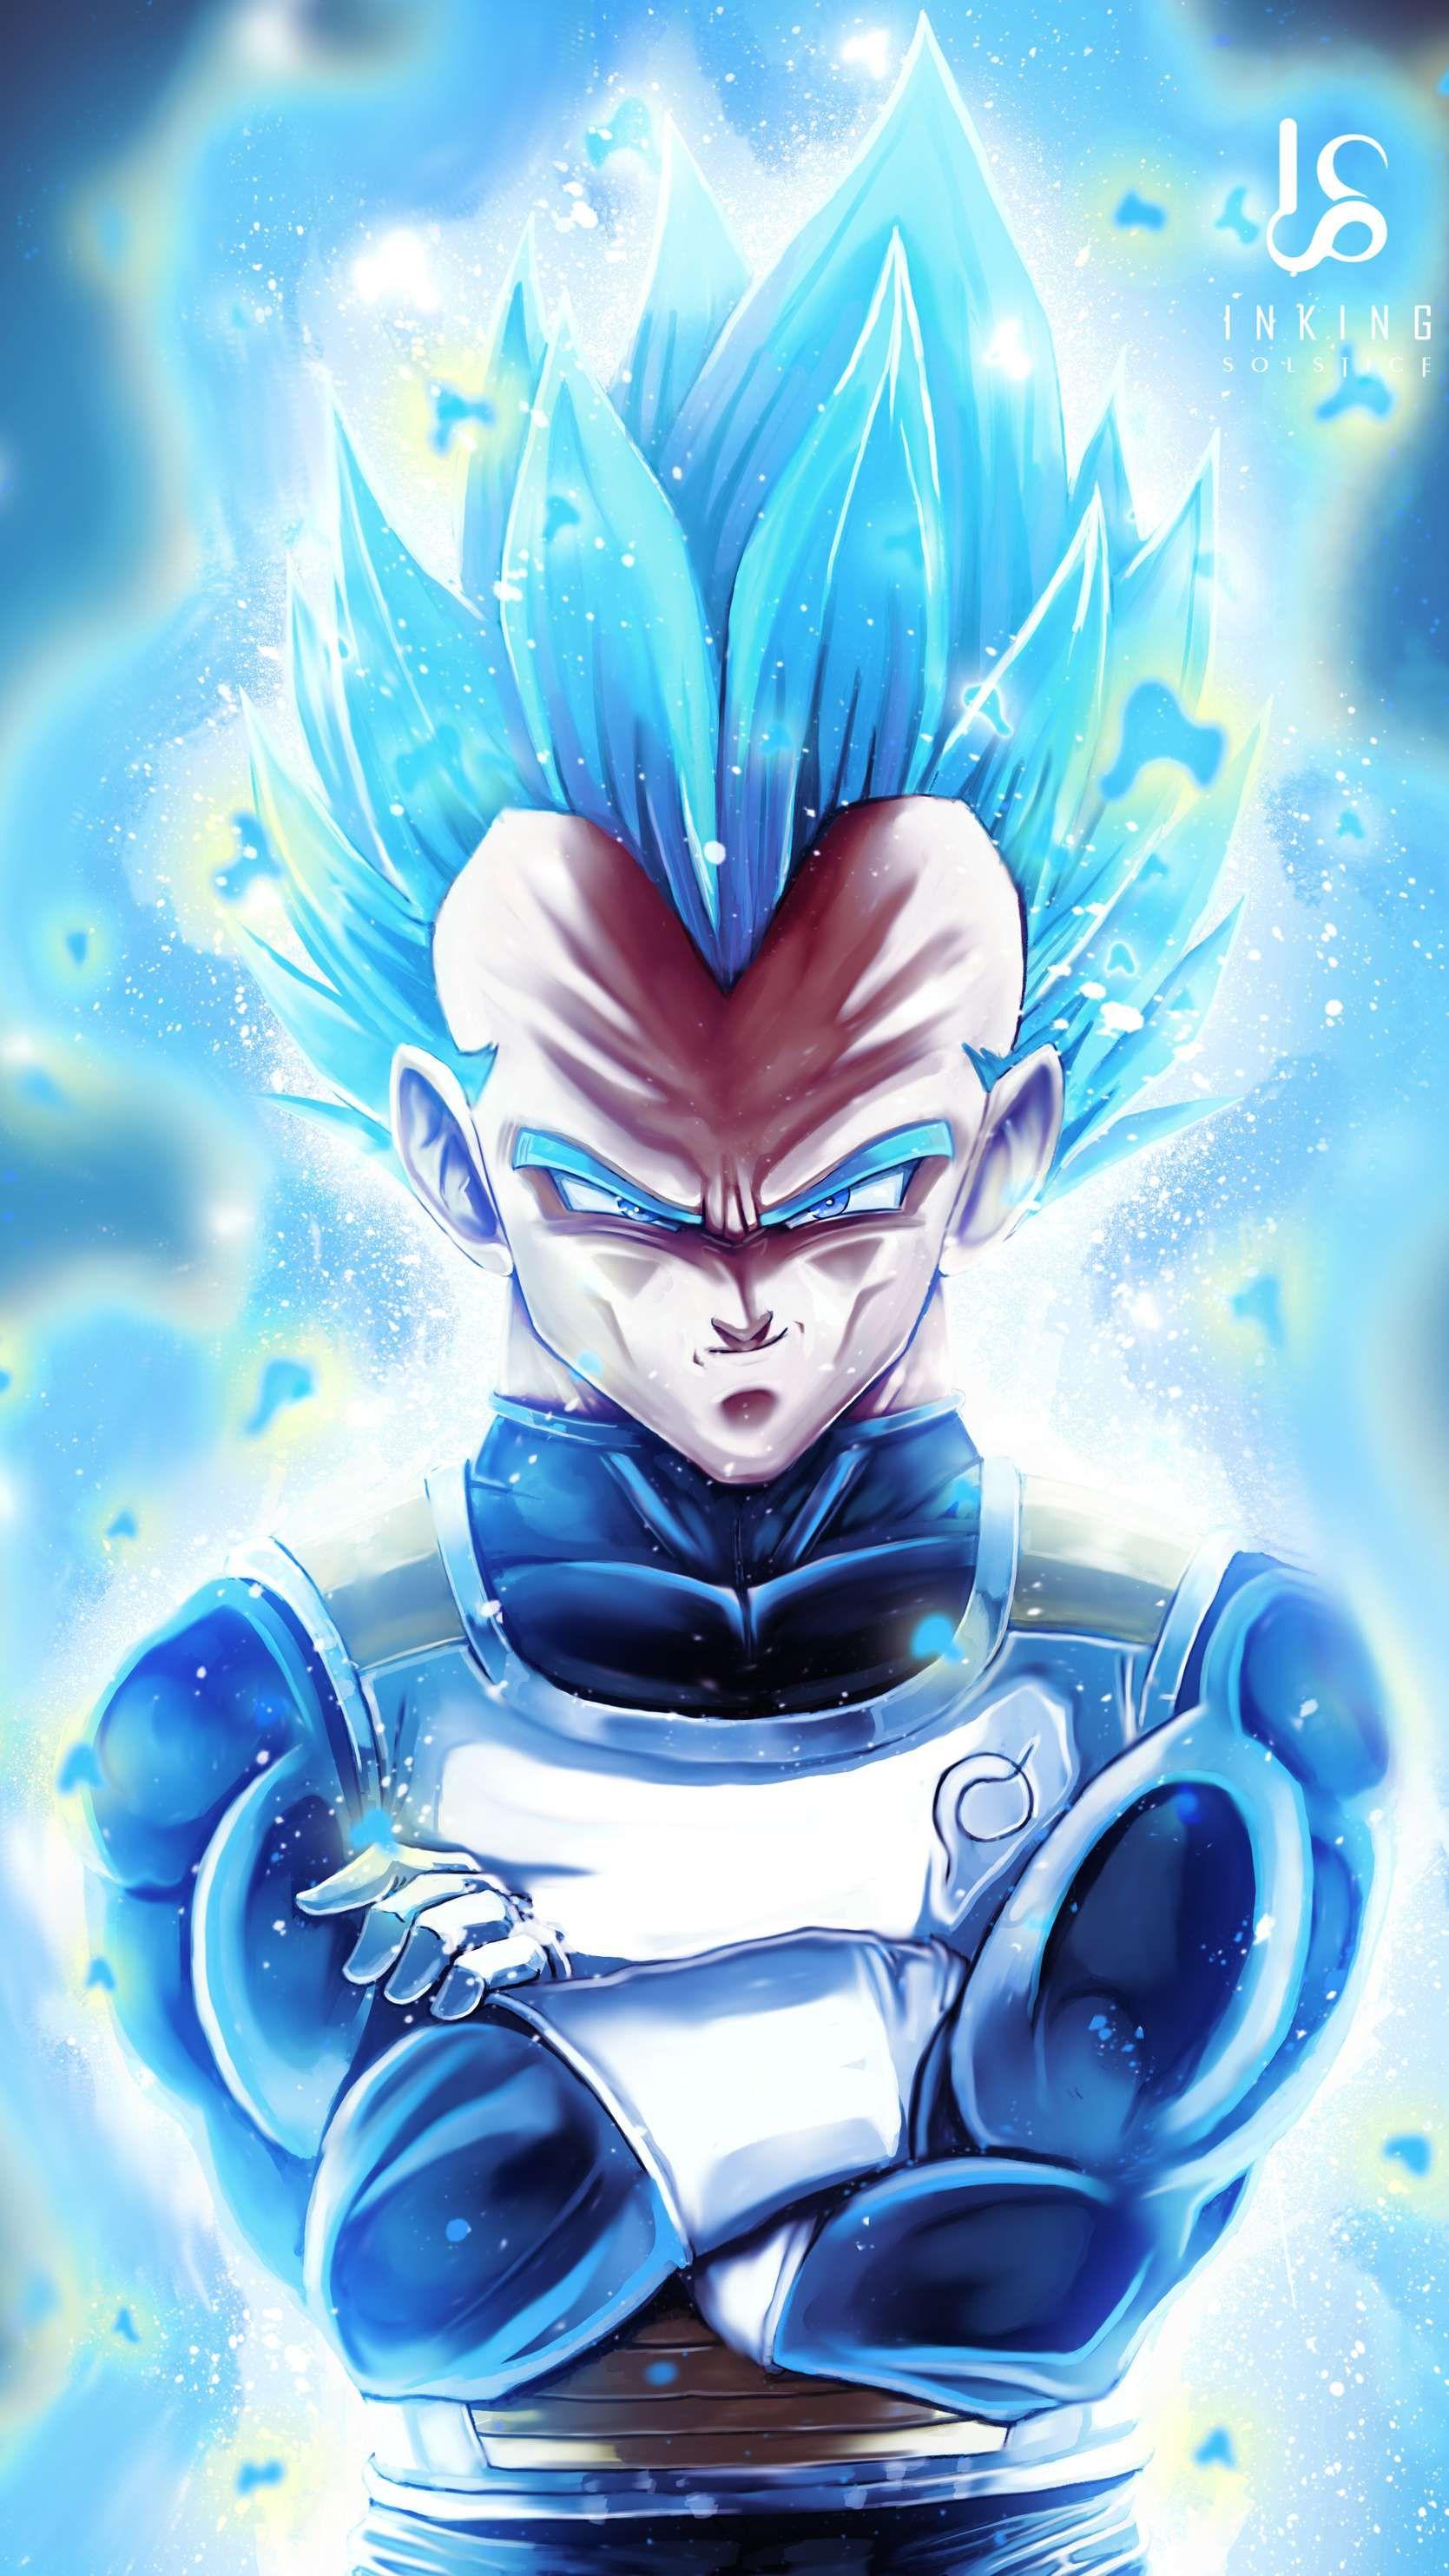 6 hours ago siennabrophy.blogspot.com view all. Vegeta Super Saiyan Blue Dragon Ball Z Wallpaper | Anime ...